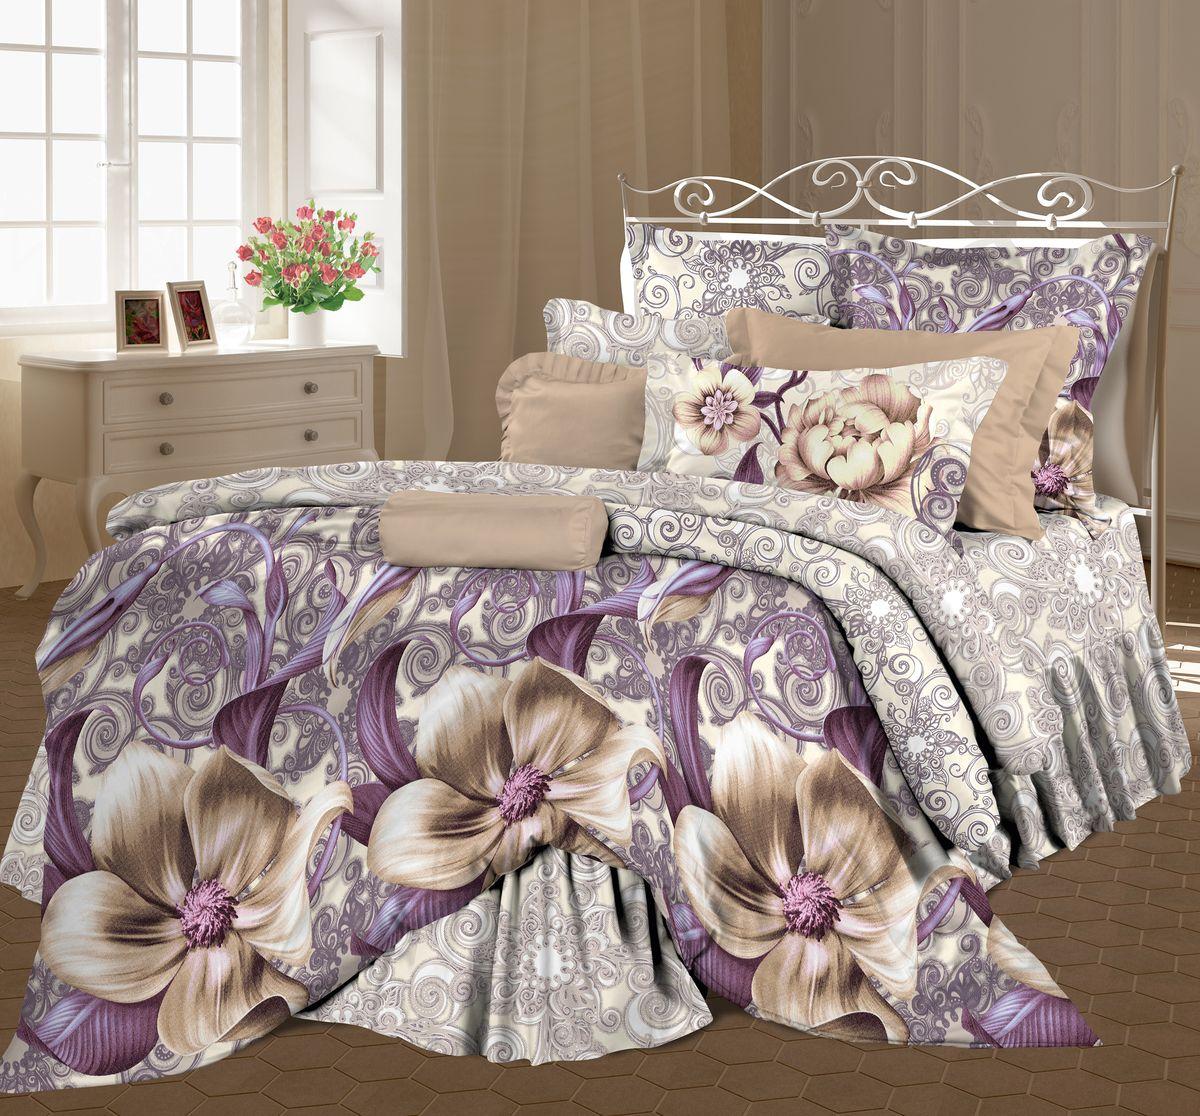 Комплект белья Романтика Энигма, 2-х спальное, наволочки 70 x 70, цвет: сиреневый. 317938317938